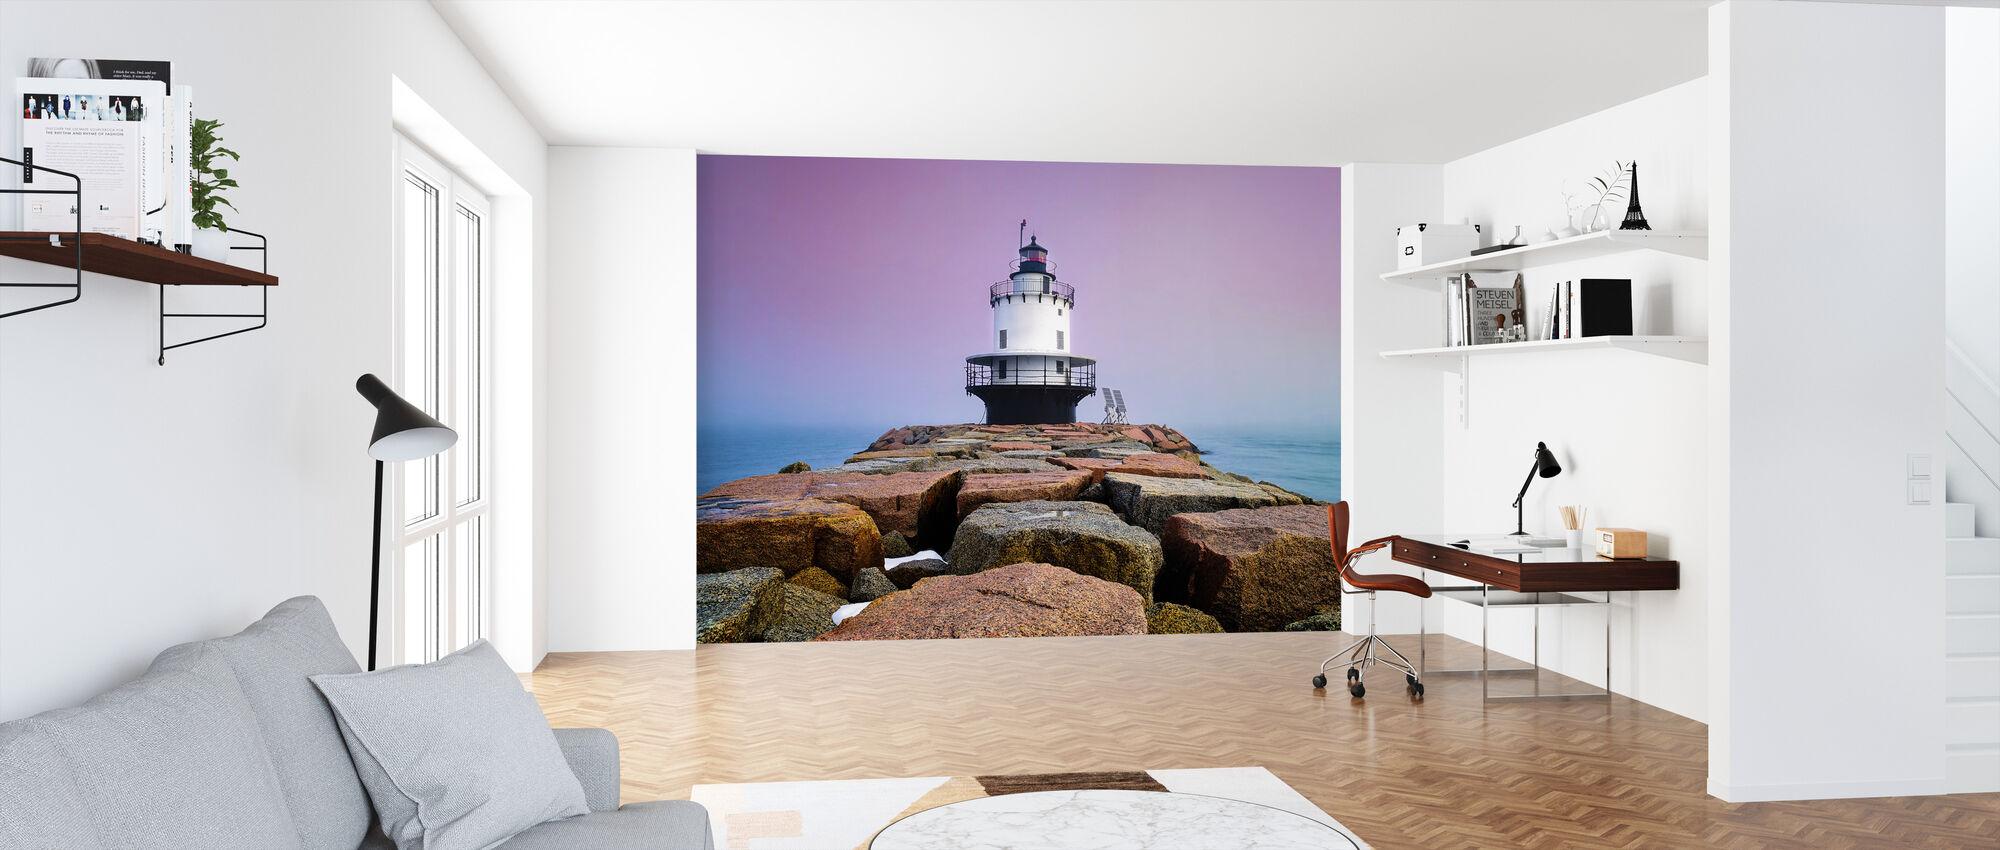 Spring Point Light - Wallpaper - Office